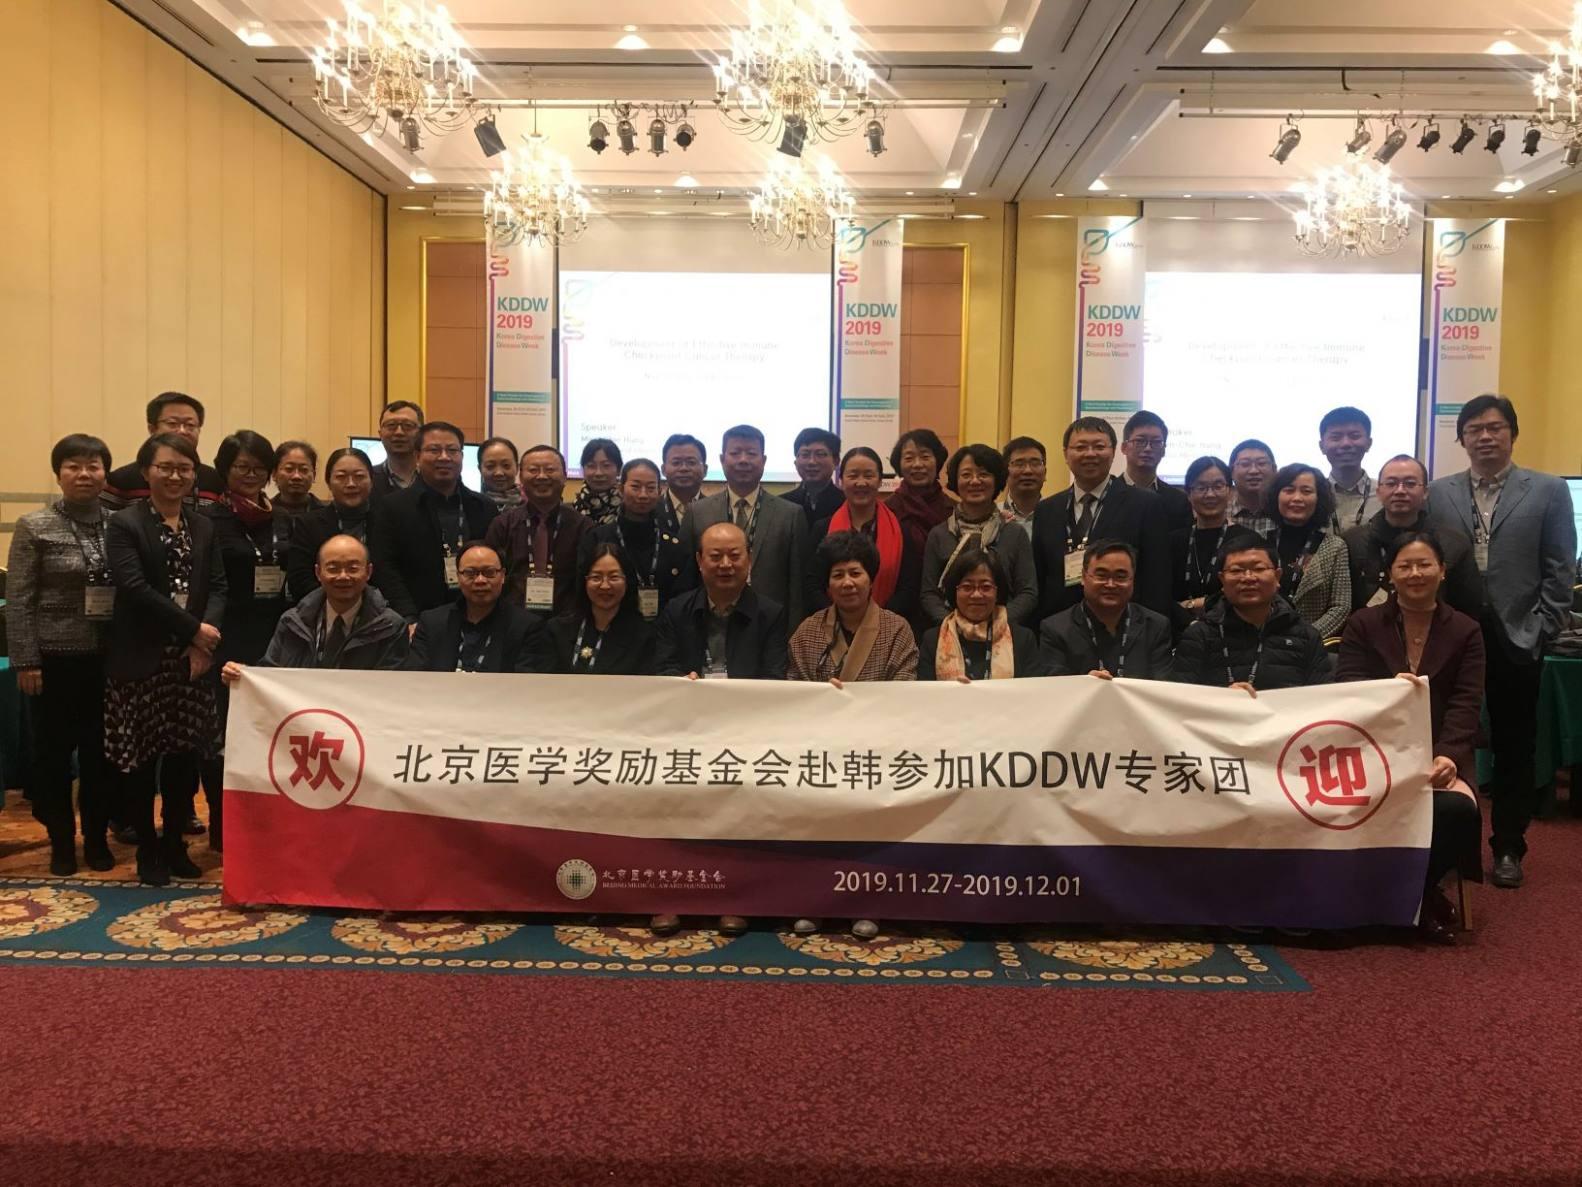 2019KDDW医学消化会议2M